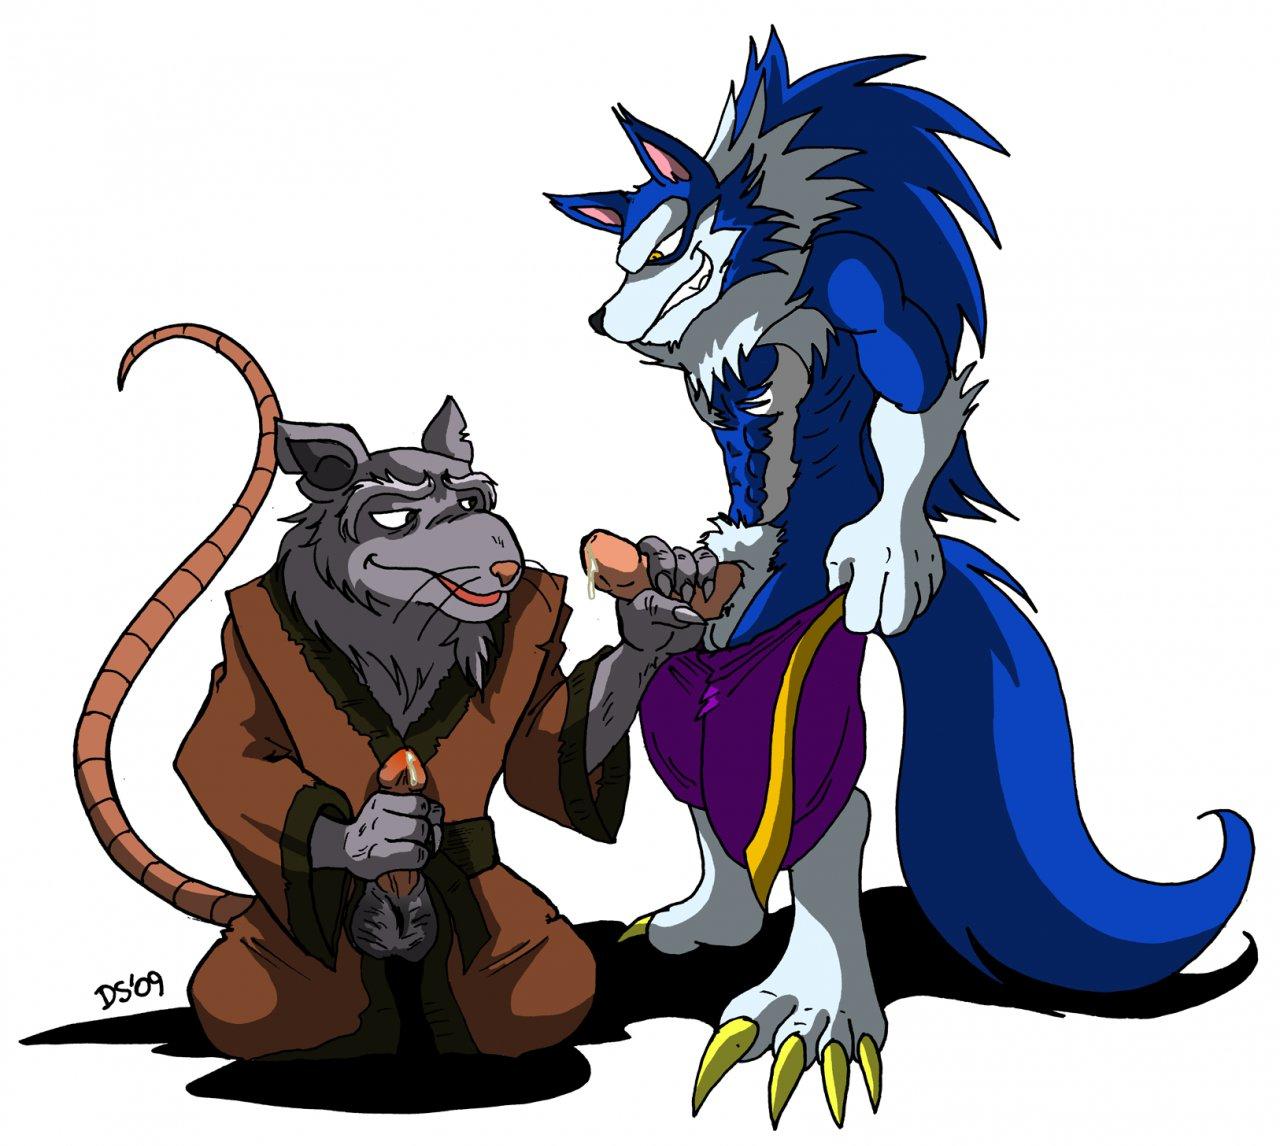 talbain and felicia darkstalkers jon Renkin san-kyuu magical